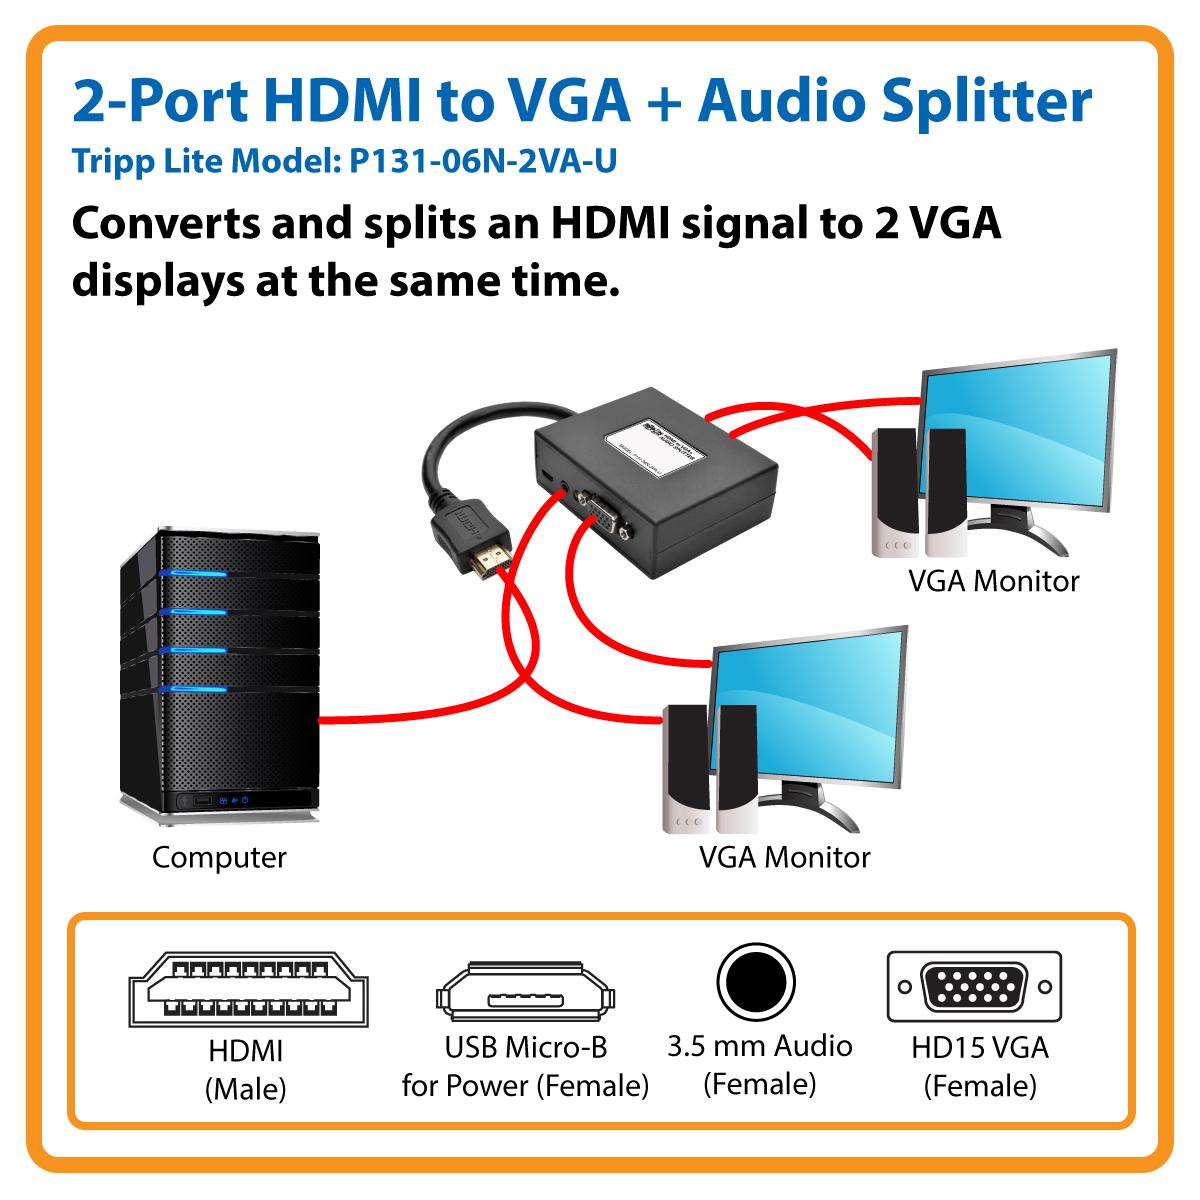 Tripp Lite Hdmi To Vga Audio Adapter Converter Splitter 2 Port Spliter Converts And Splits An Signal Displays